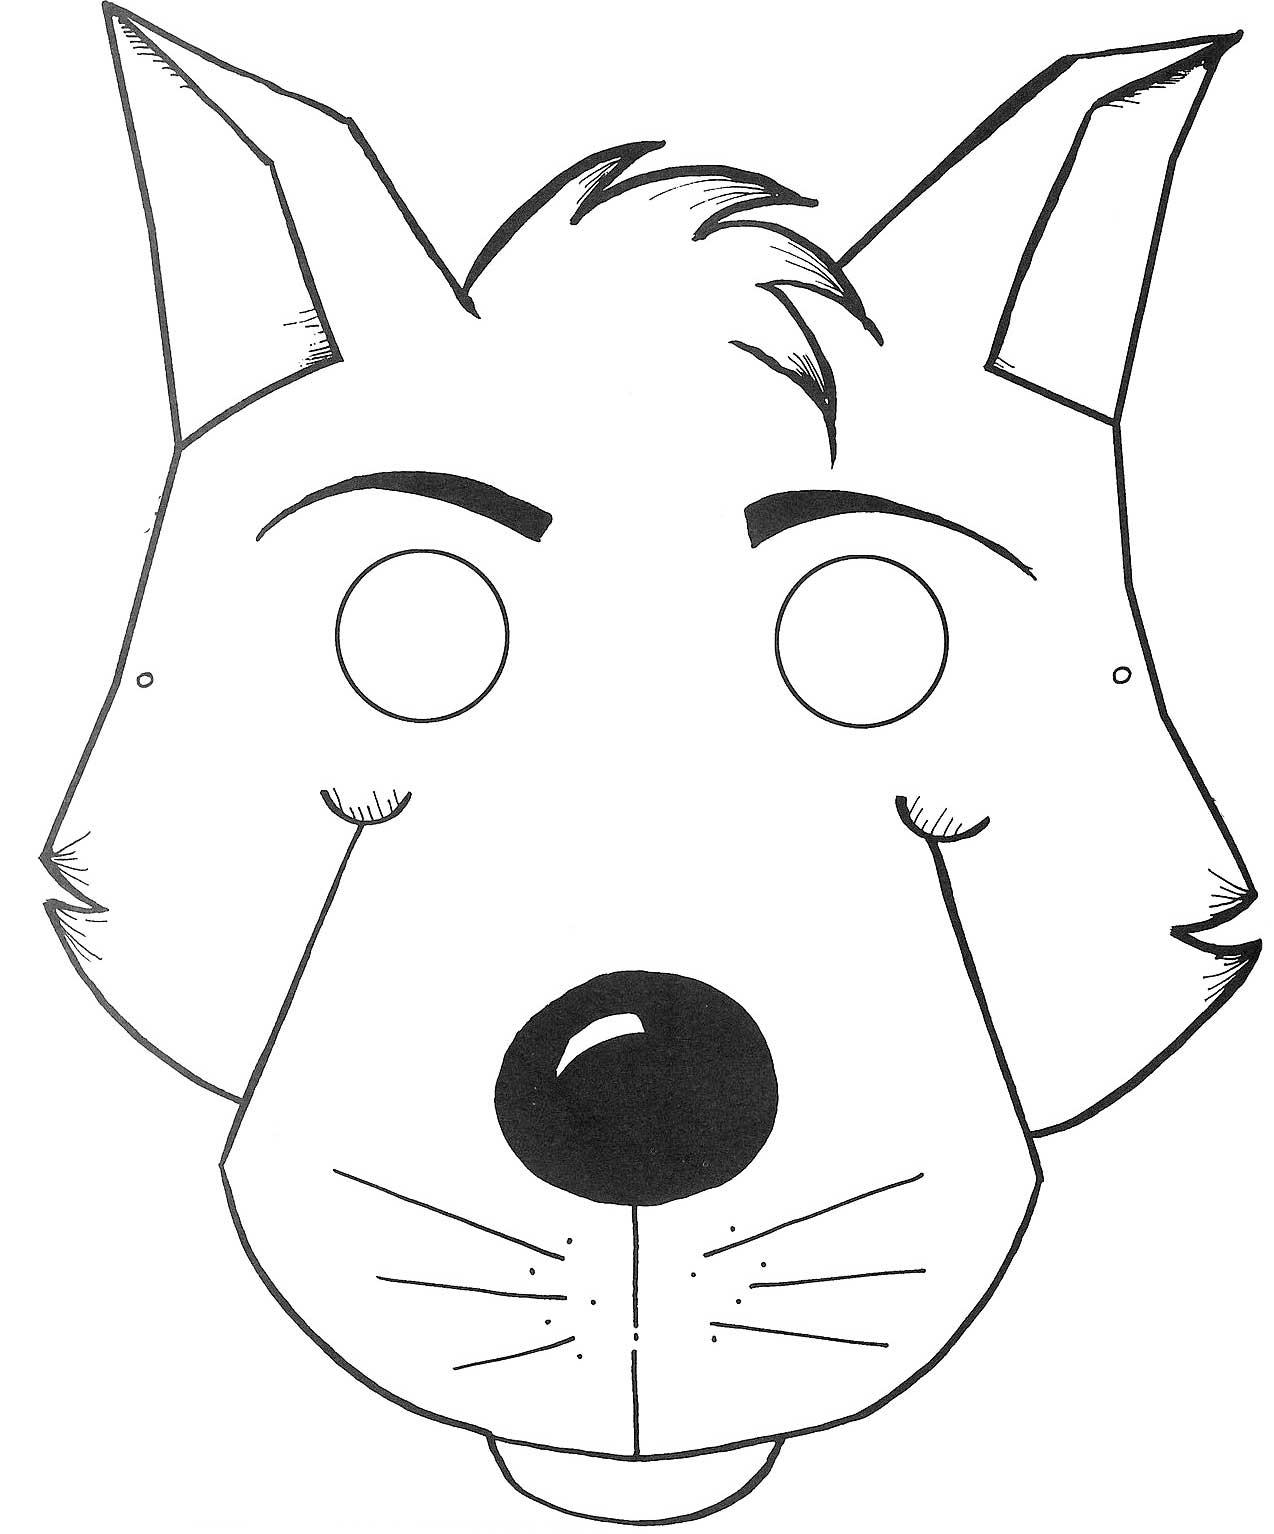 Fotos de mascaras de lobos - Imagui